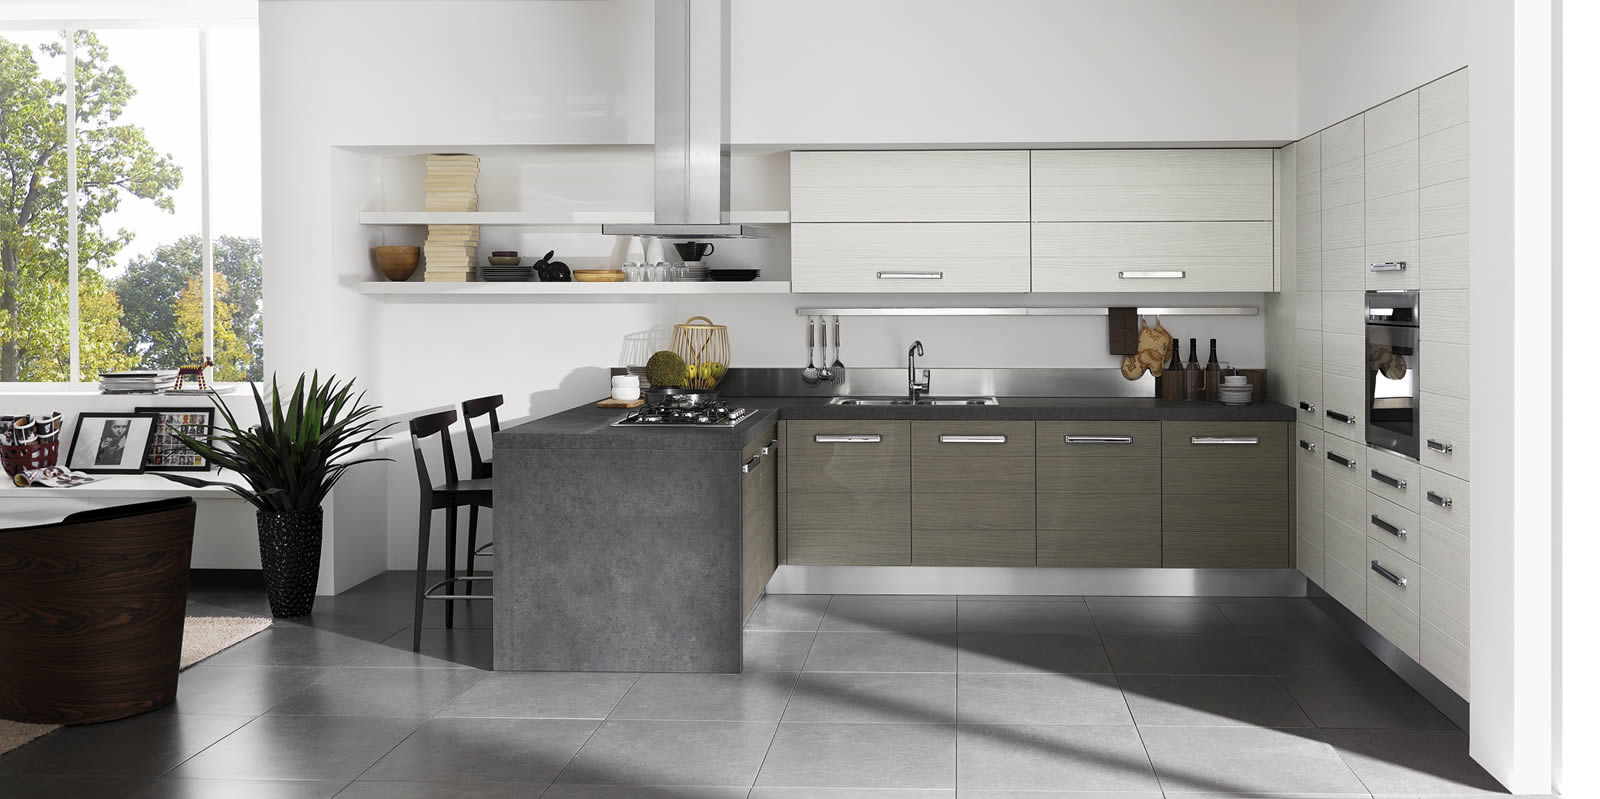 Doga colours aran kuhinje for Cucine moderne con penisola